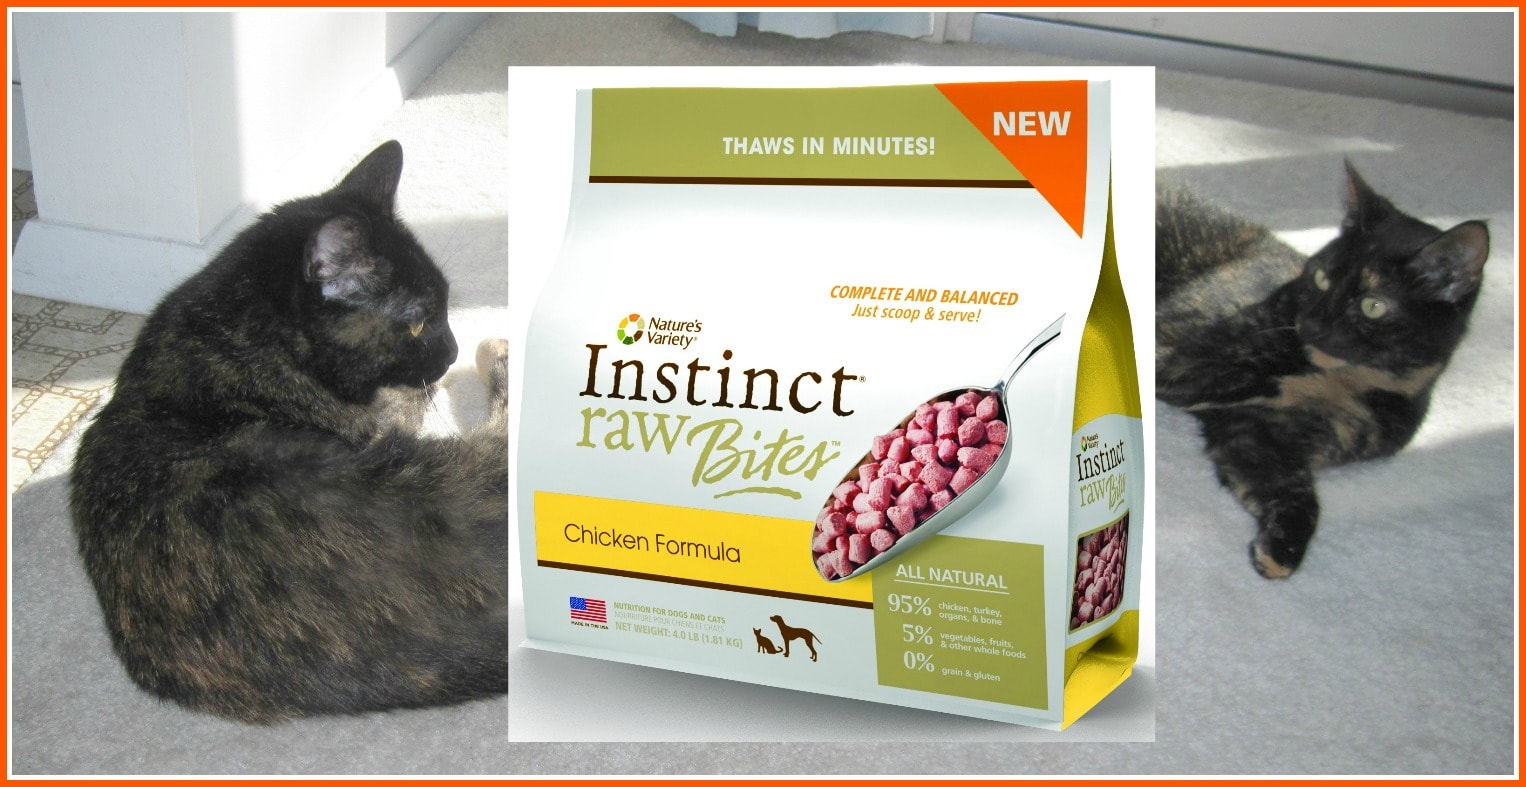 Instinct Cat Food Rabbit Review